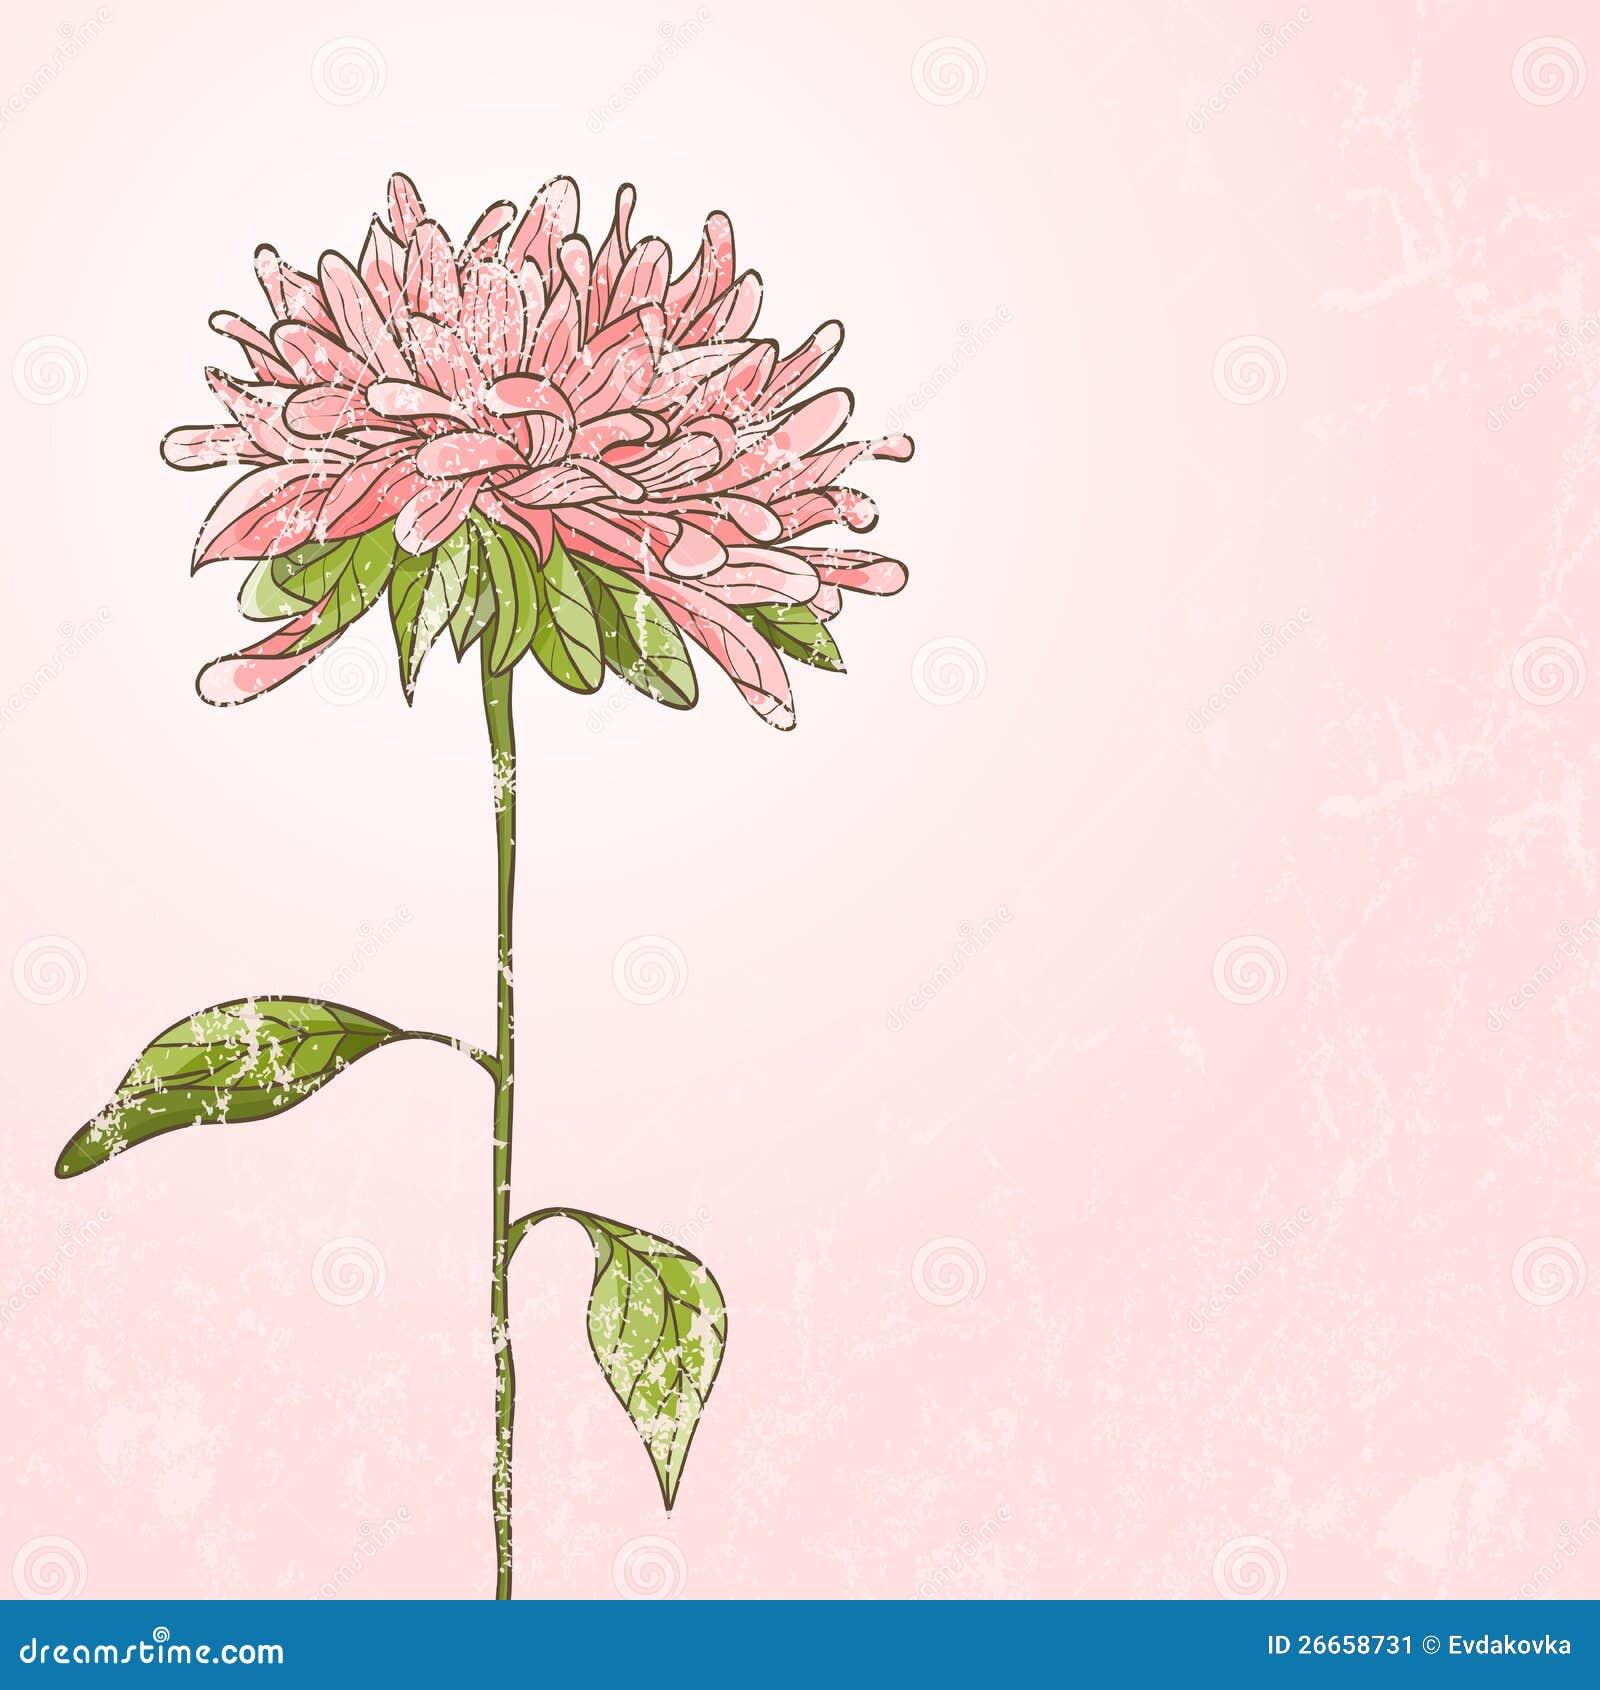 цветок рисованный картинки: